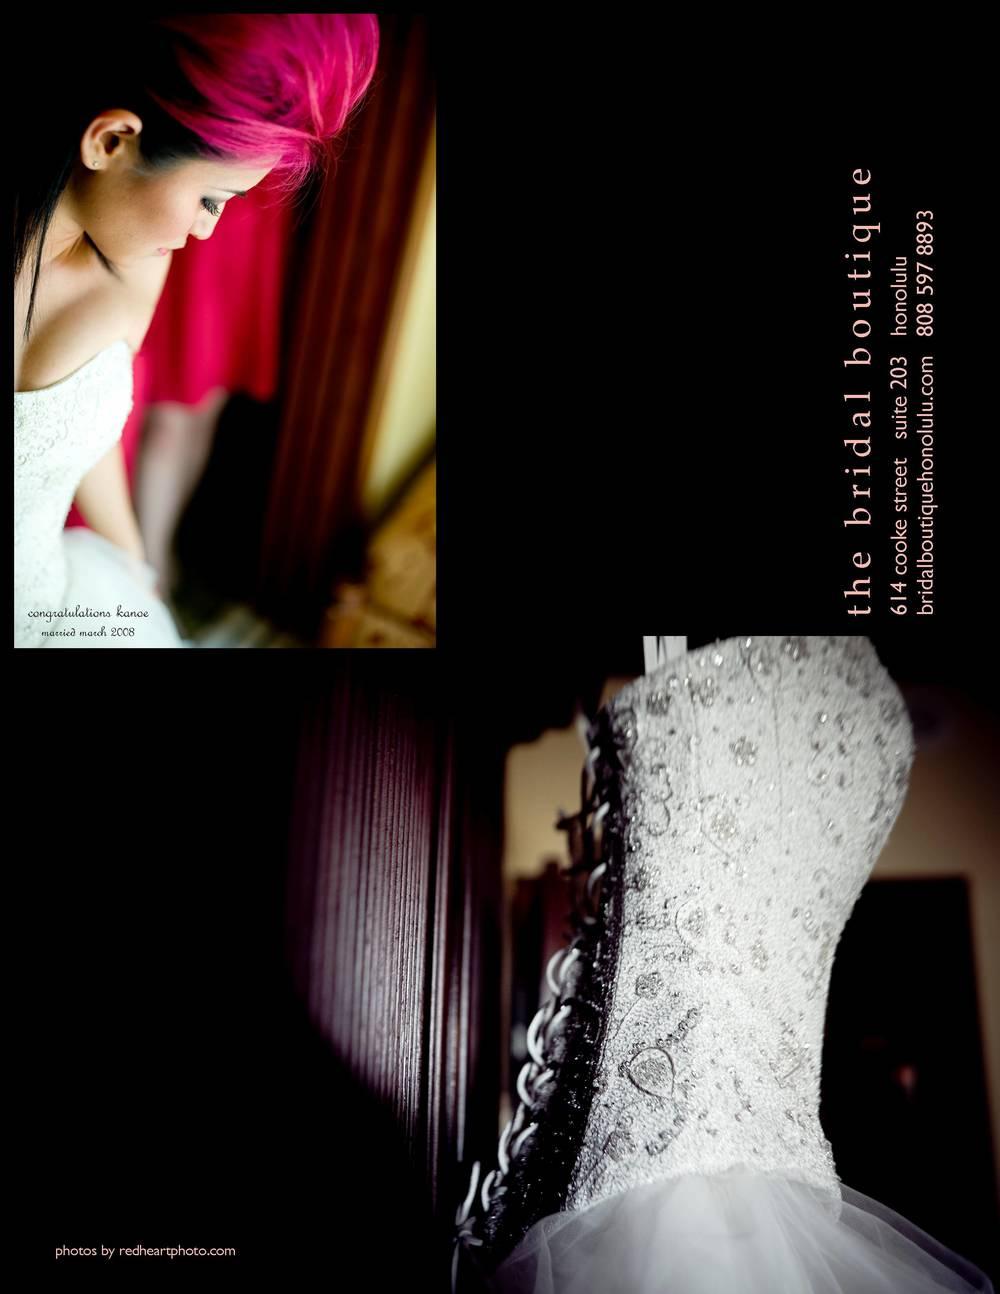 2008 Bridal Expo ad